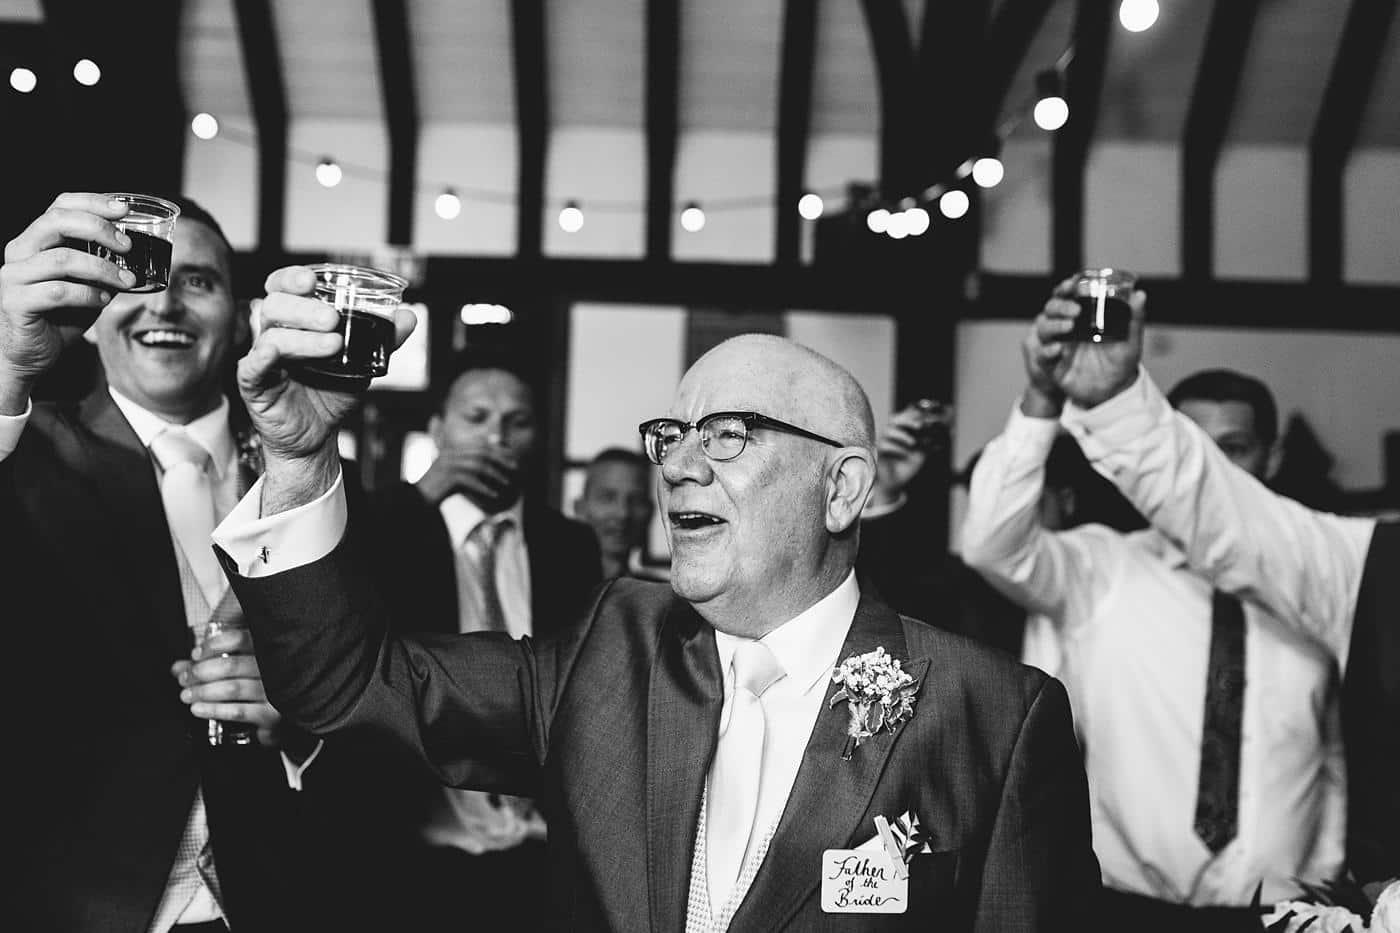 Winstanstow wedding photography 0922